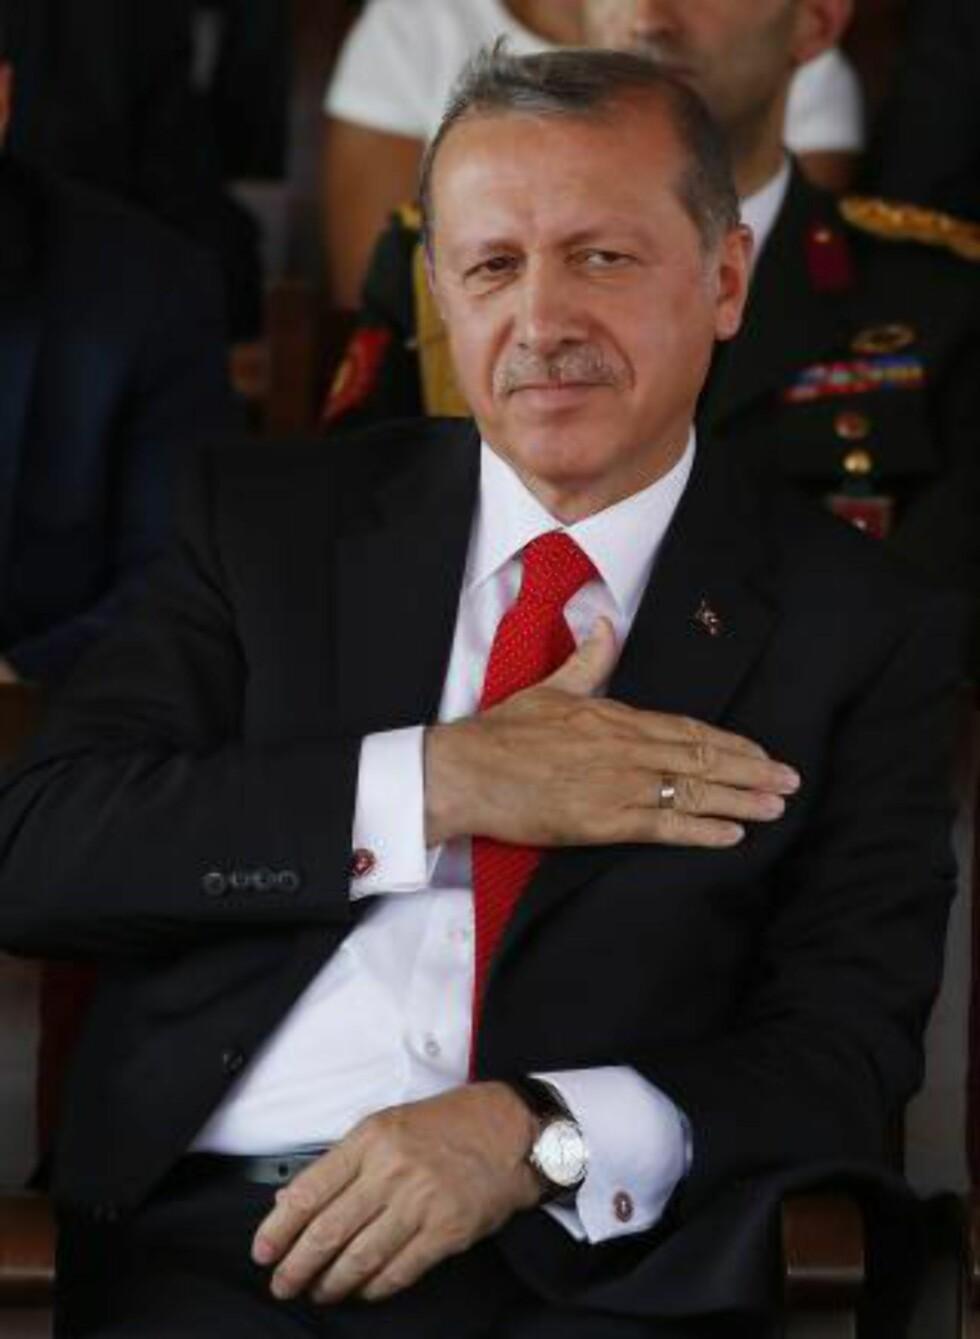 - IKKE MULIG: Tyrkias president Recep Tayyip Erdogan gir opp fredsprosessen. FOTO: AFP PHOTO / FLORIAN CHOBLET / NTB Scanpix